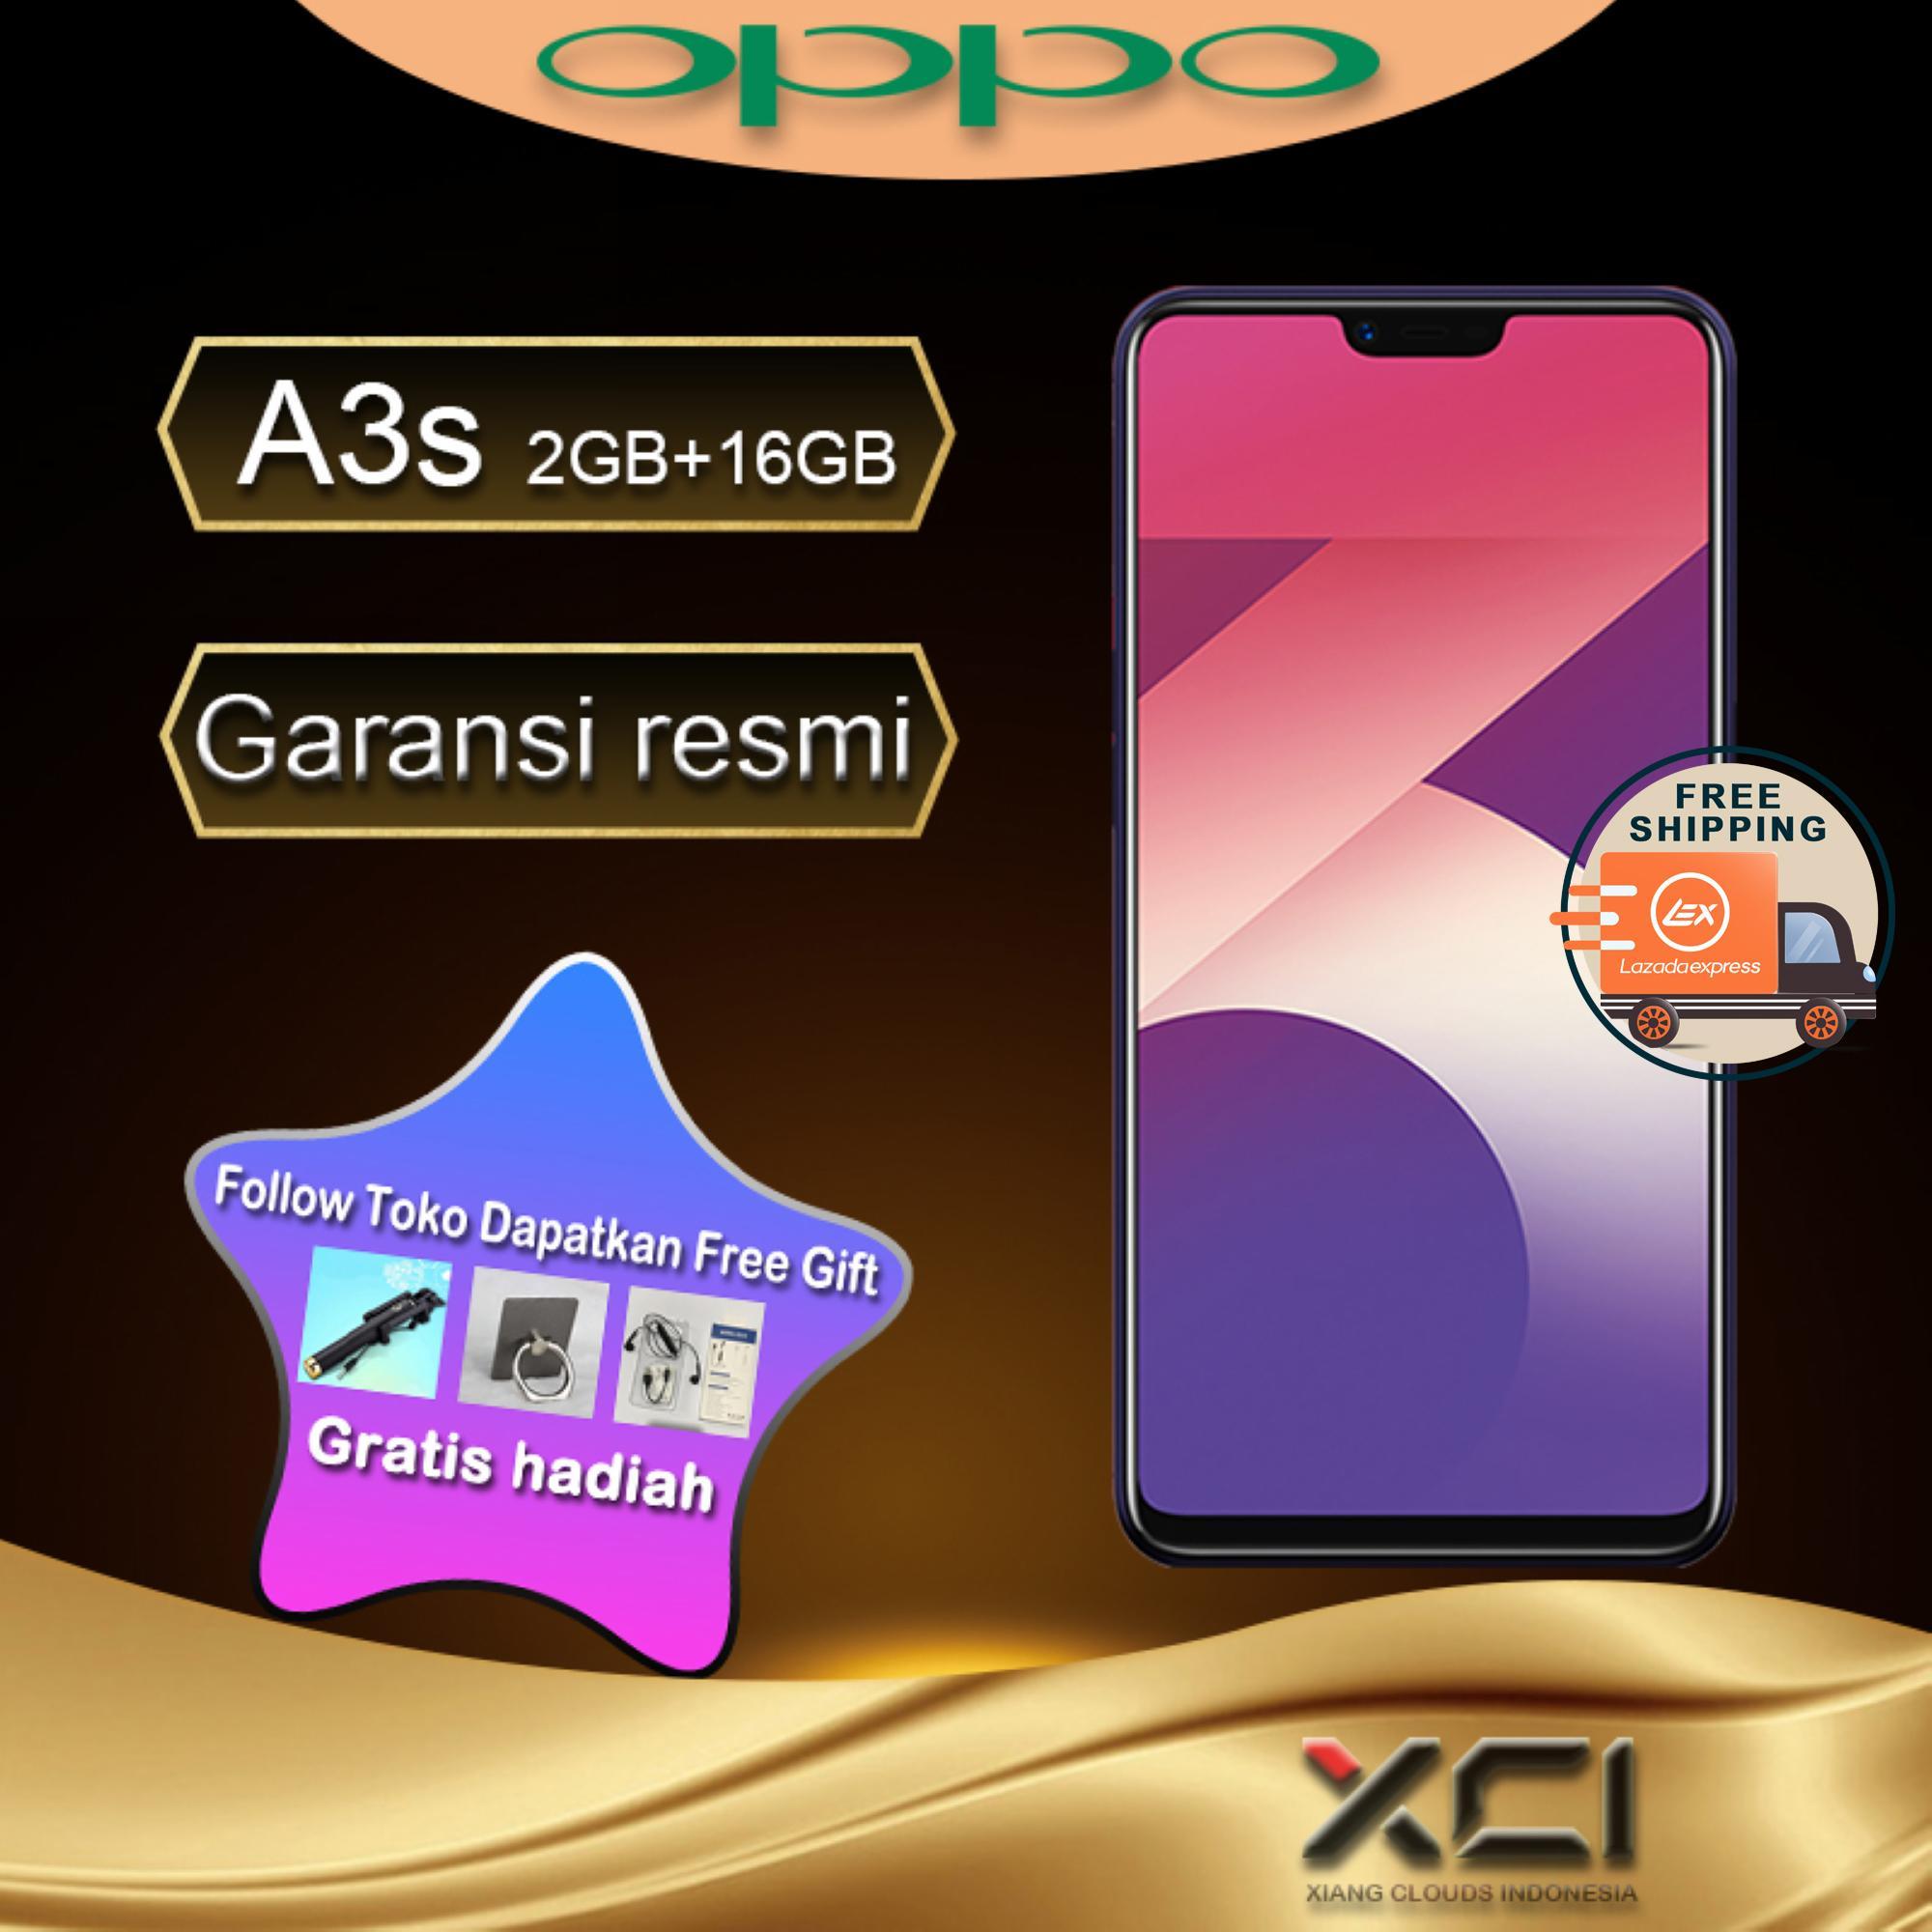 OPPO A3S 2G/16G - AI Beauty 2.0 Speedy Facial Unlock Garansi resmi